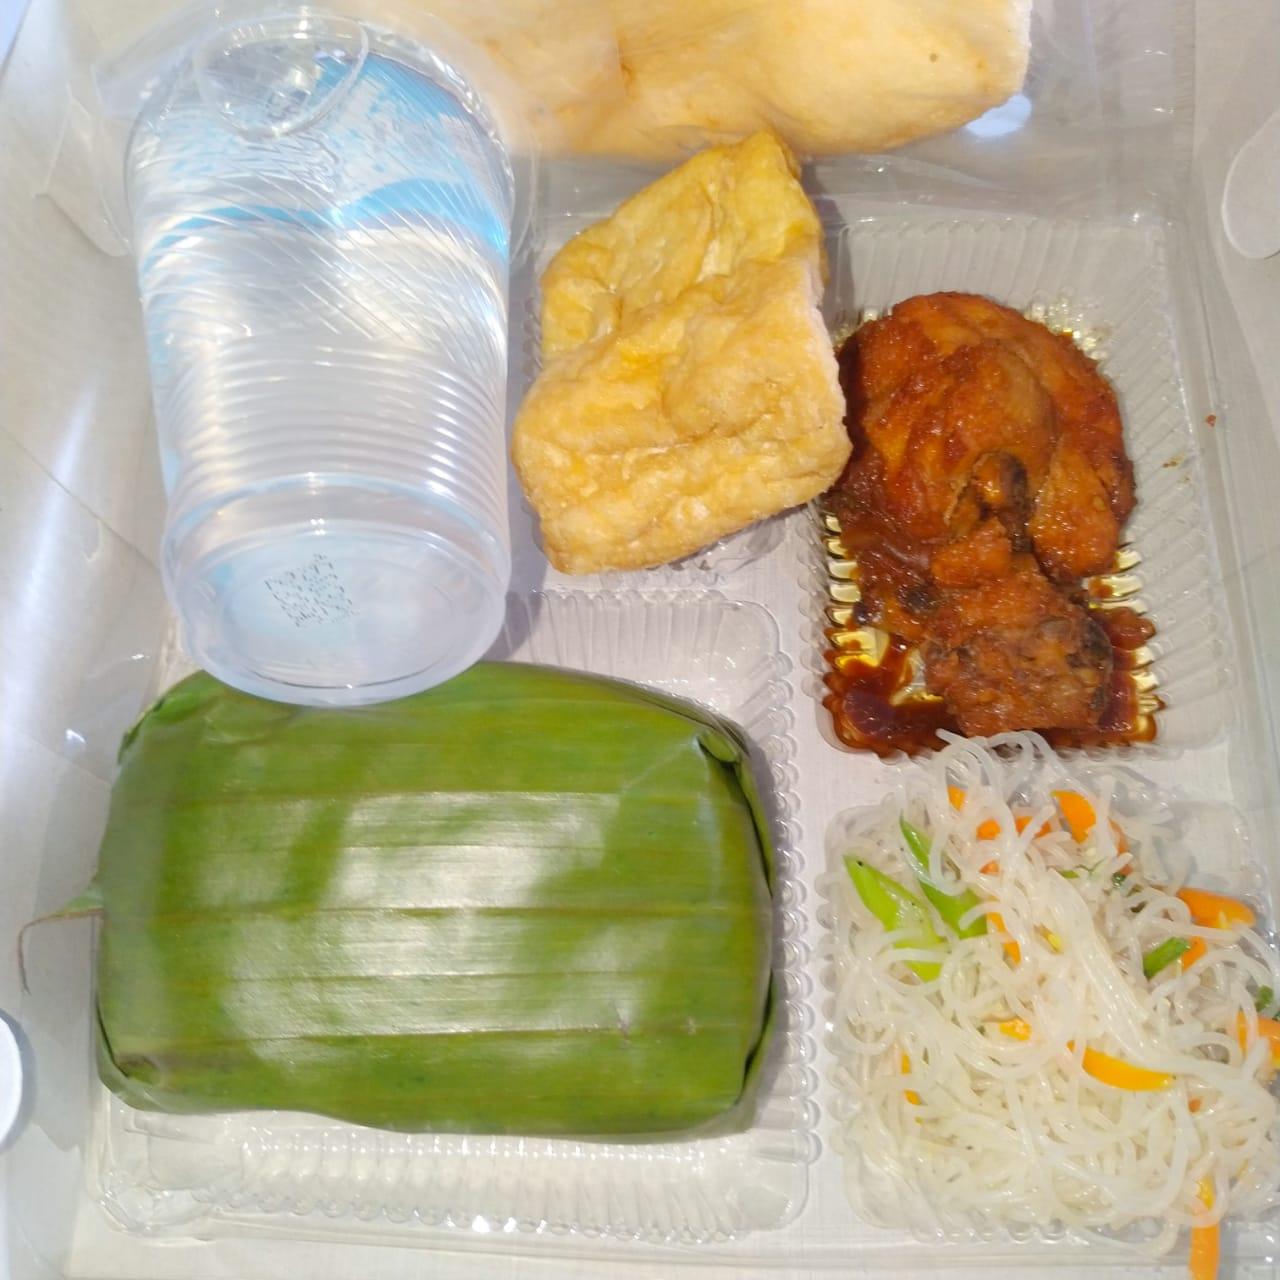 Catering Tasikmalaya